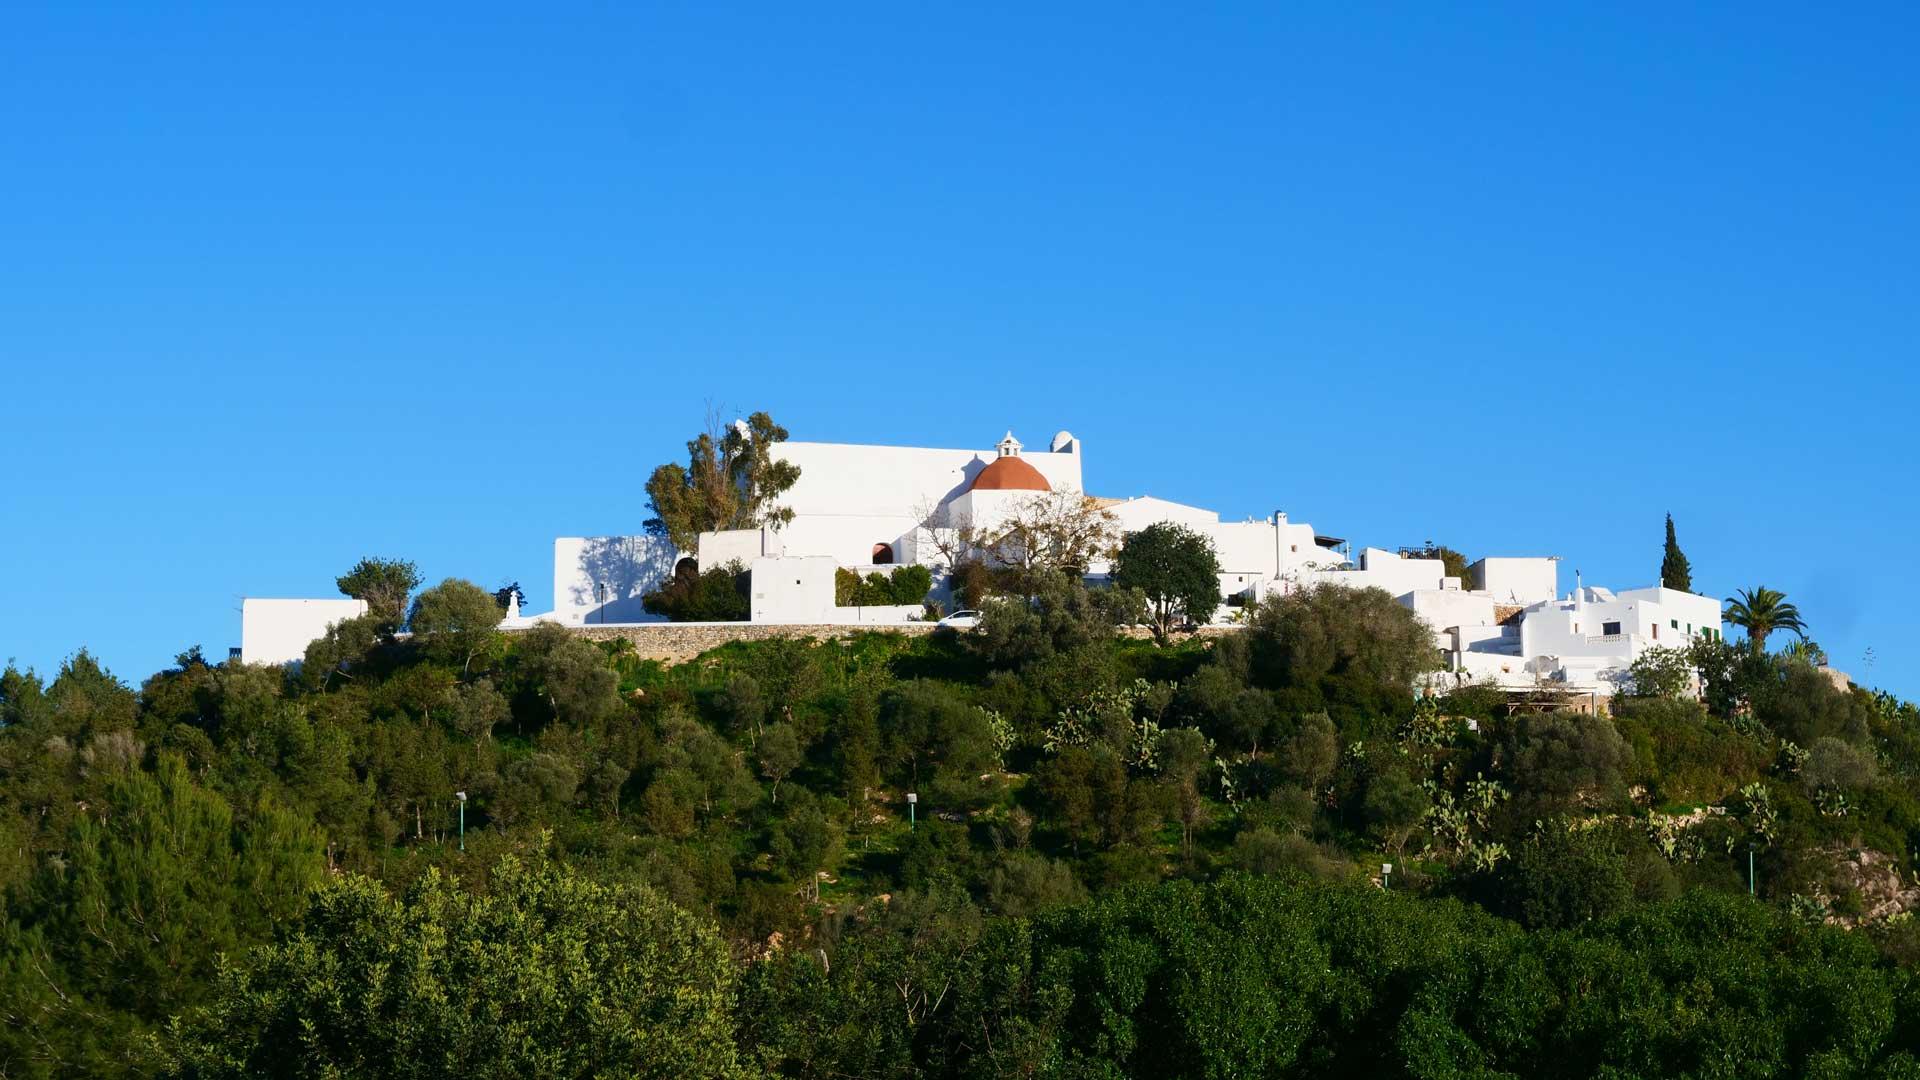 Ibiza, Santa Eulalia